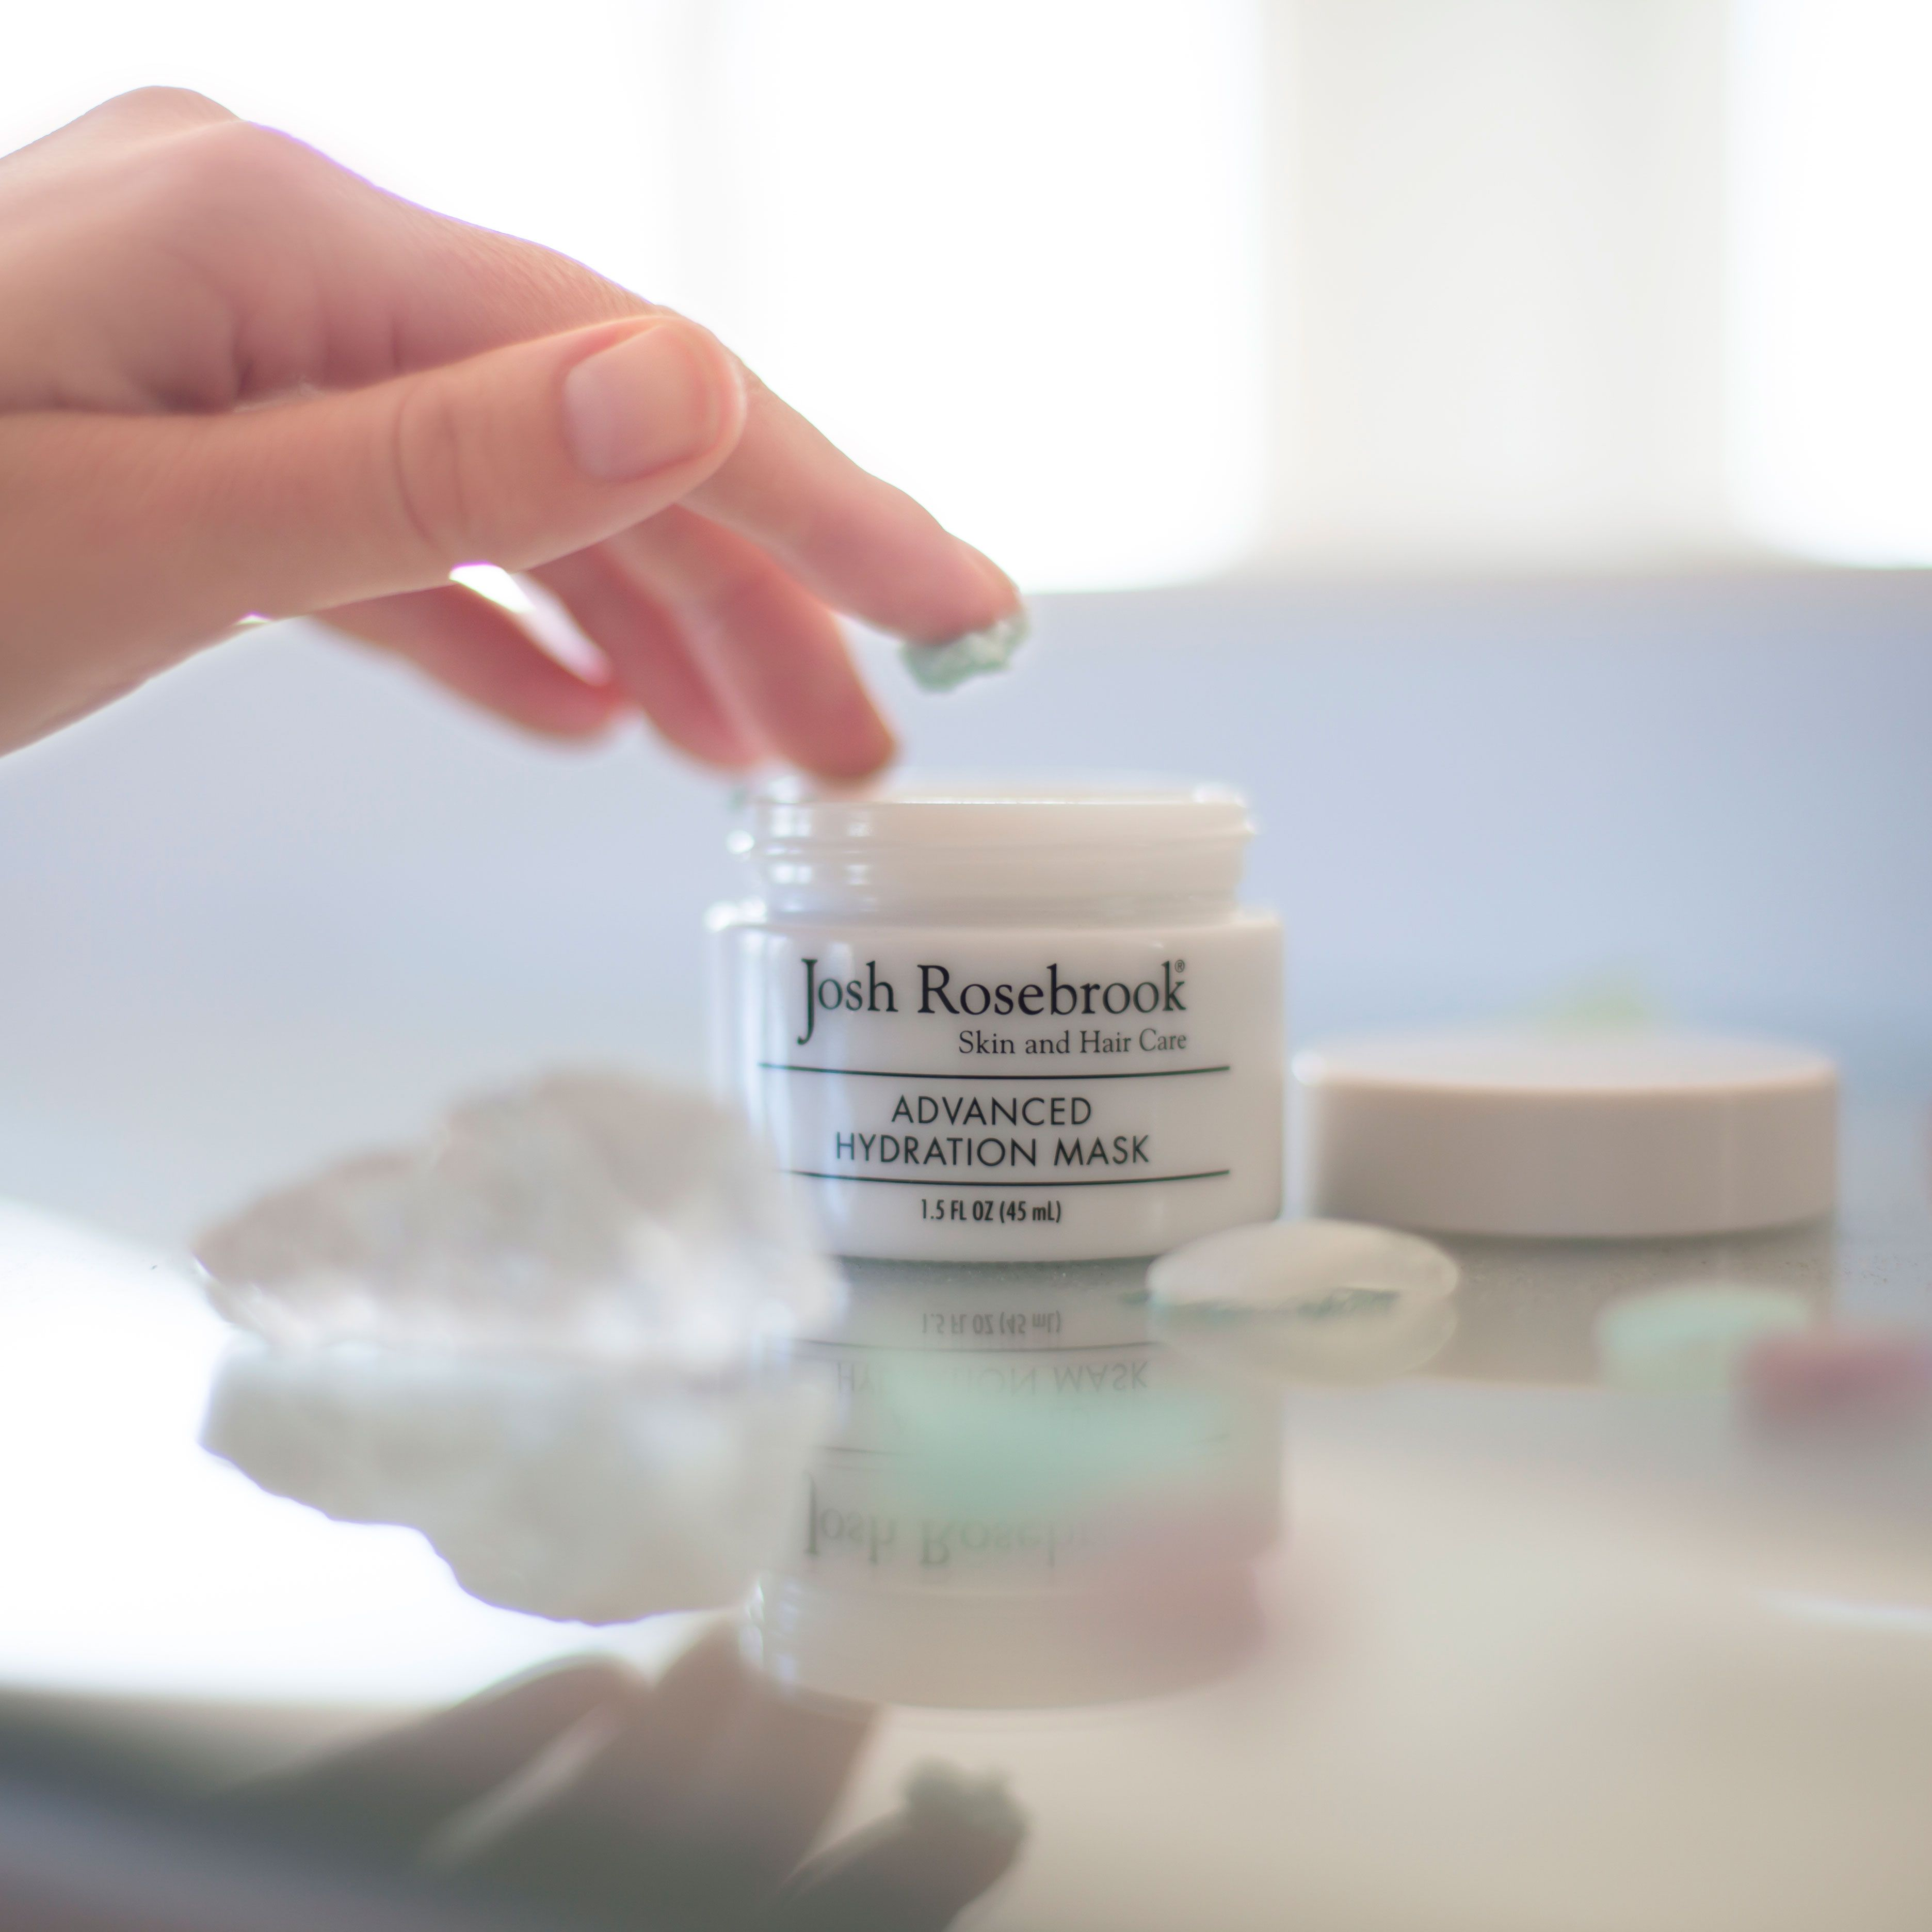 Josh Rosebrook Advanced Hydration Mask skincare